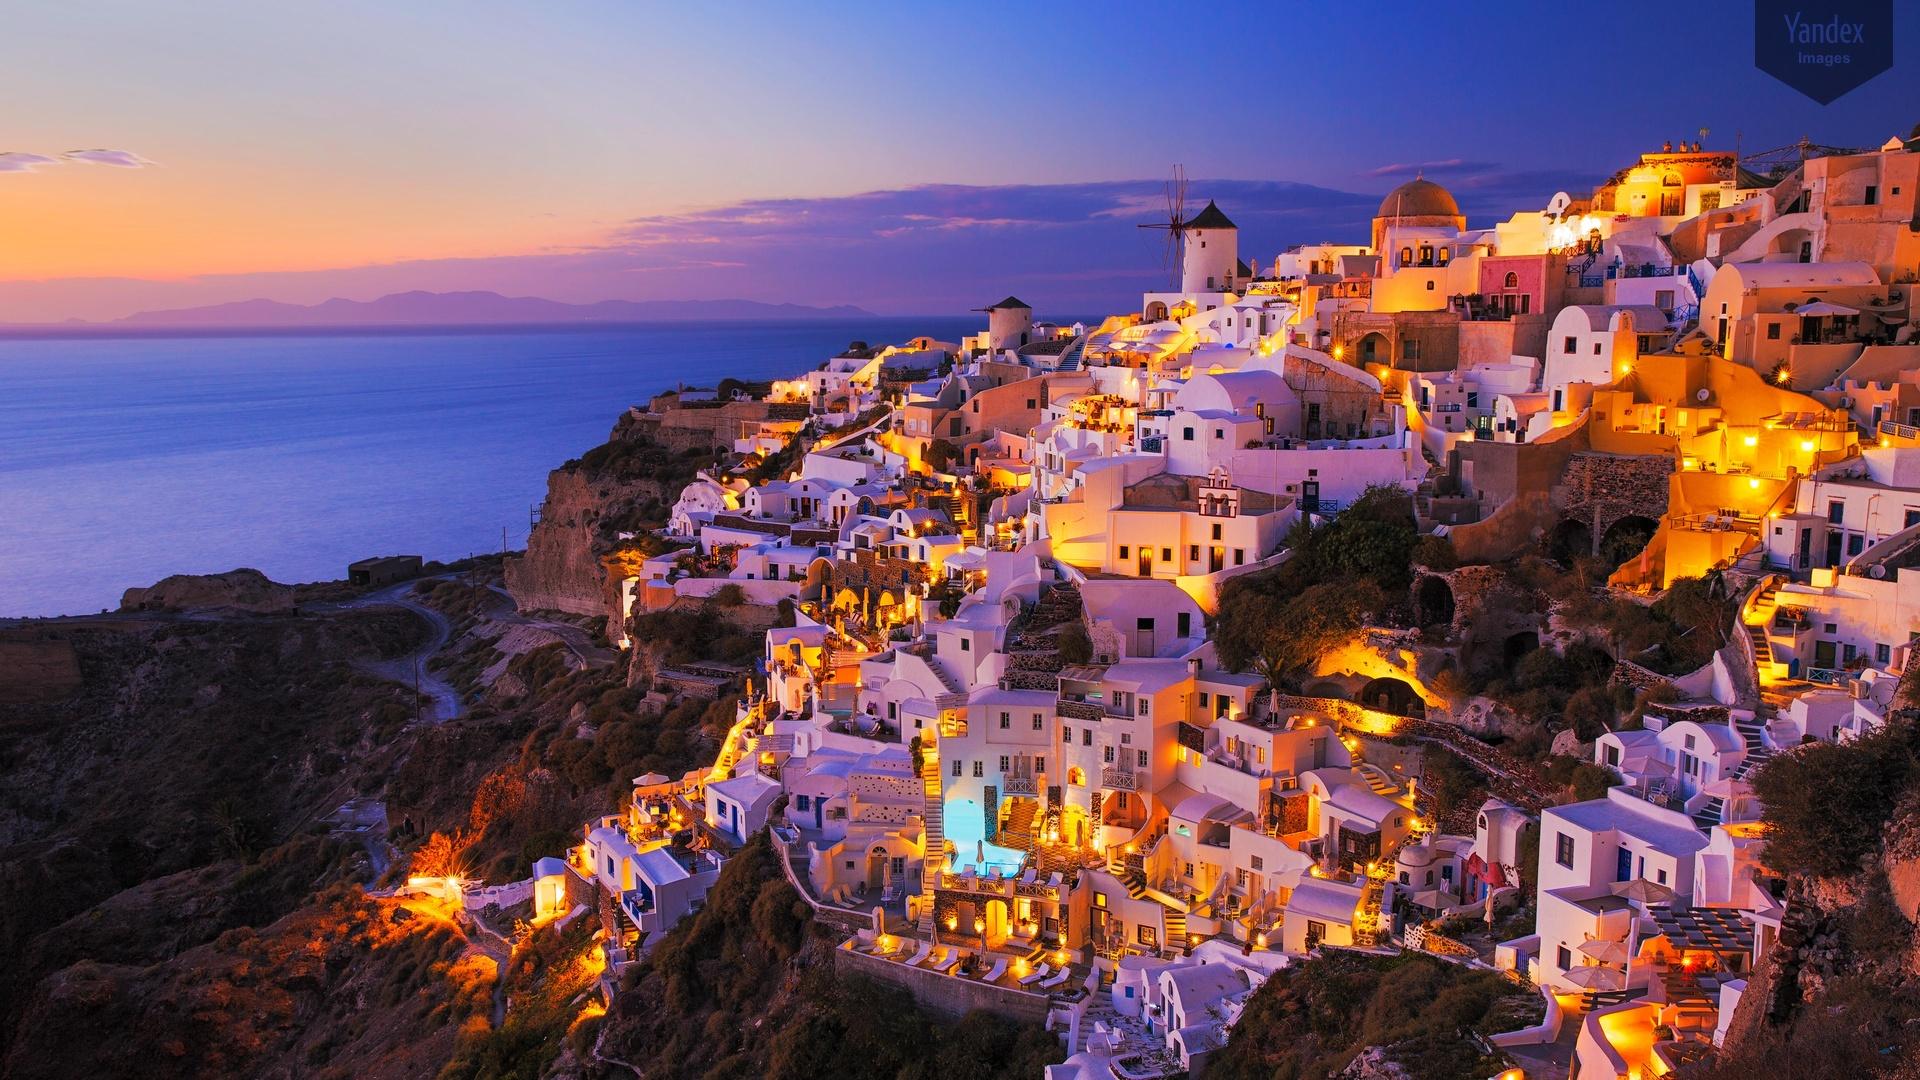 greece wallpapers santorini hd - photo #22